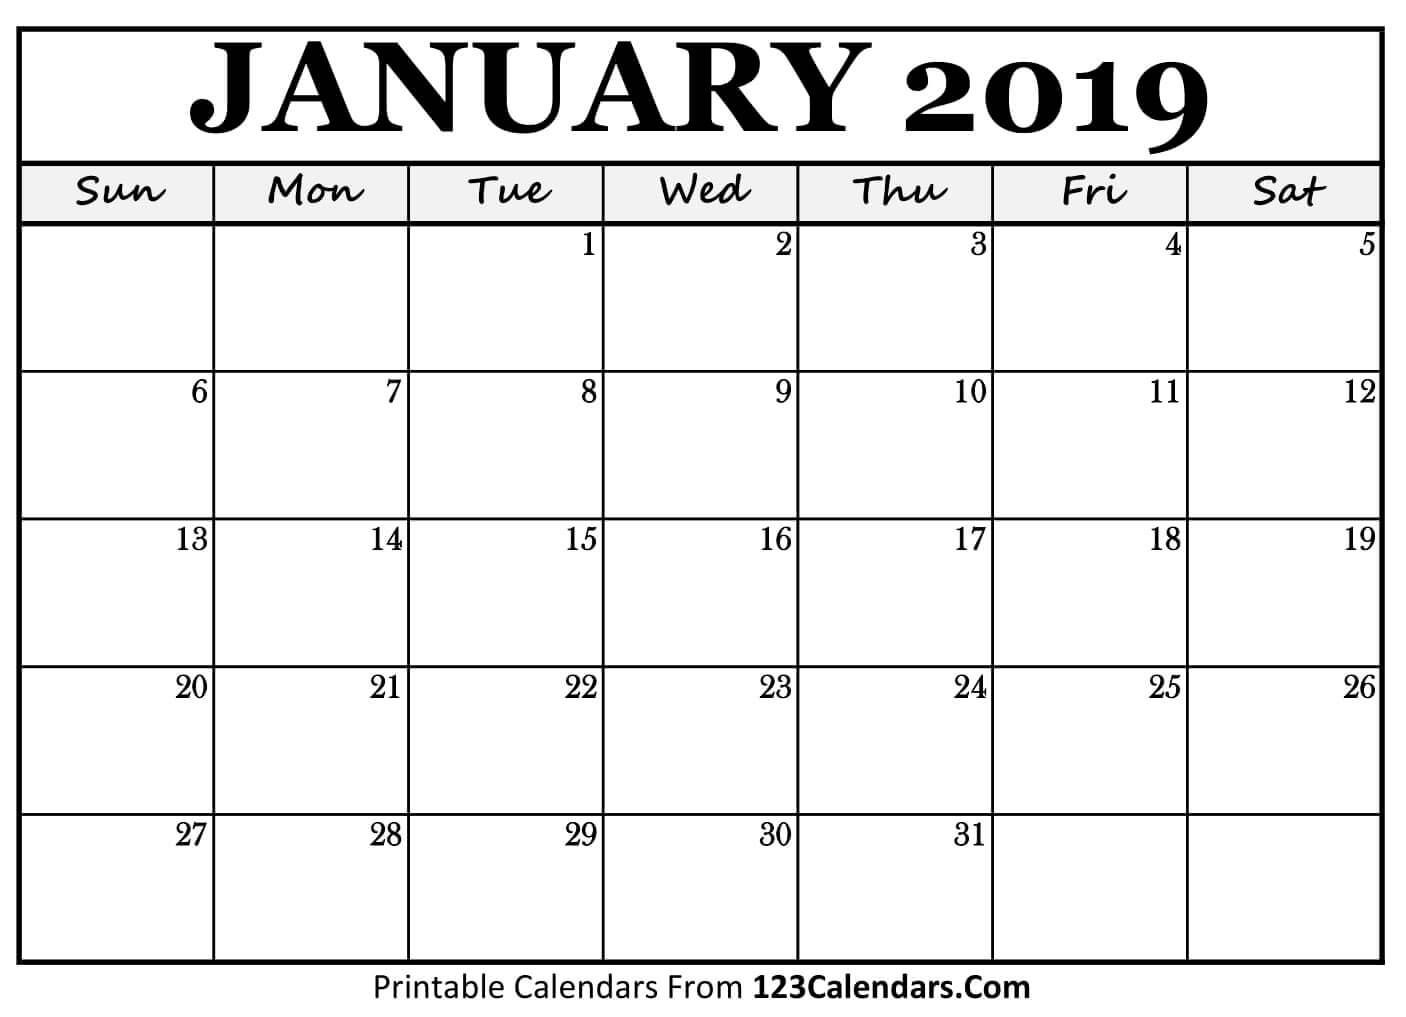 Free Printable Calendar January 2019 Printable January 2019 Calendar Templates 123calendars